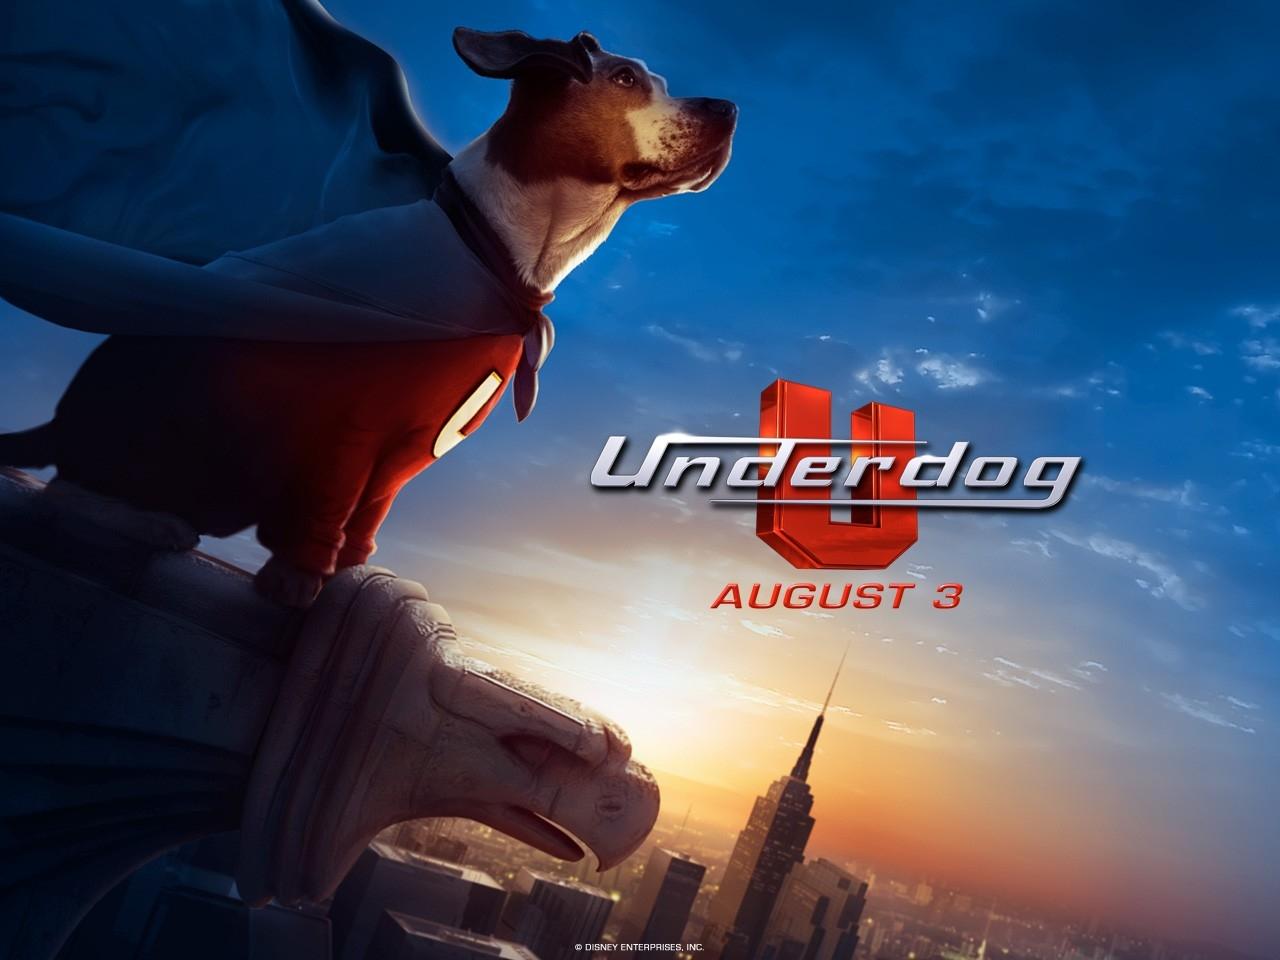 Wallpaper del film Underdog - Storia di un vero supereroe